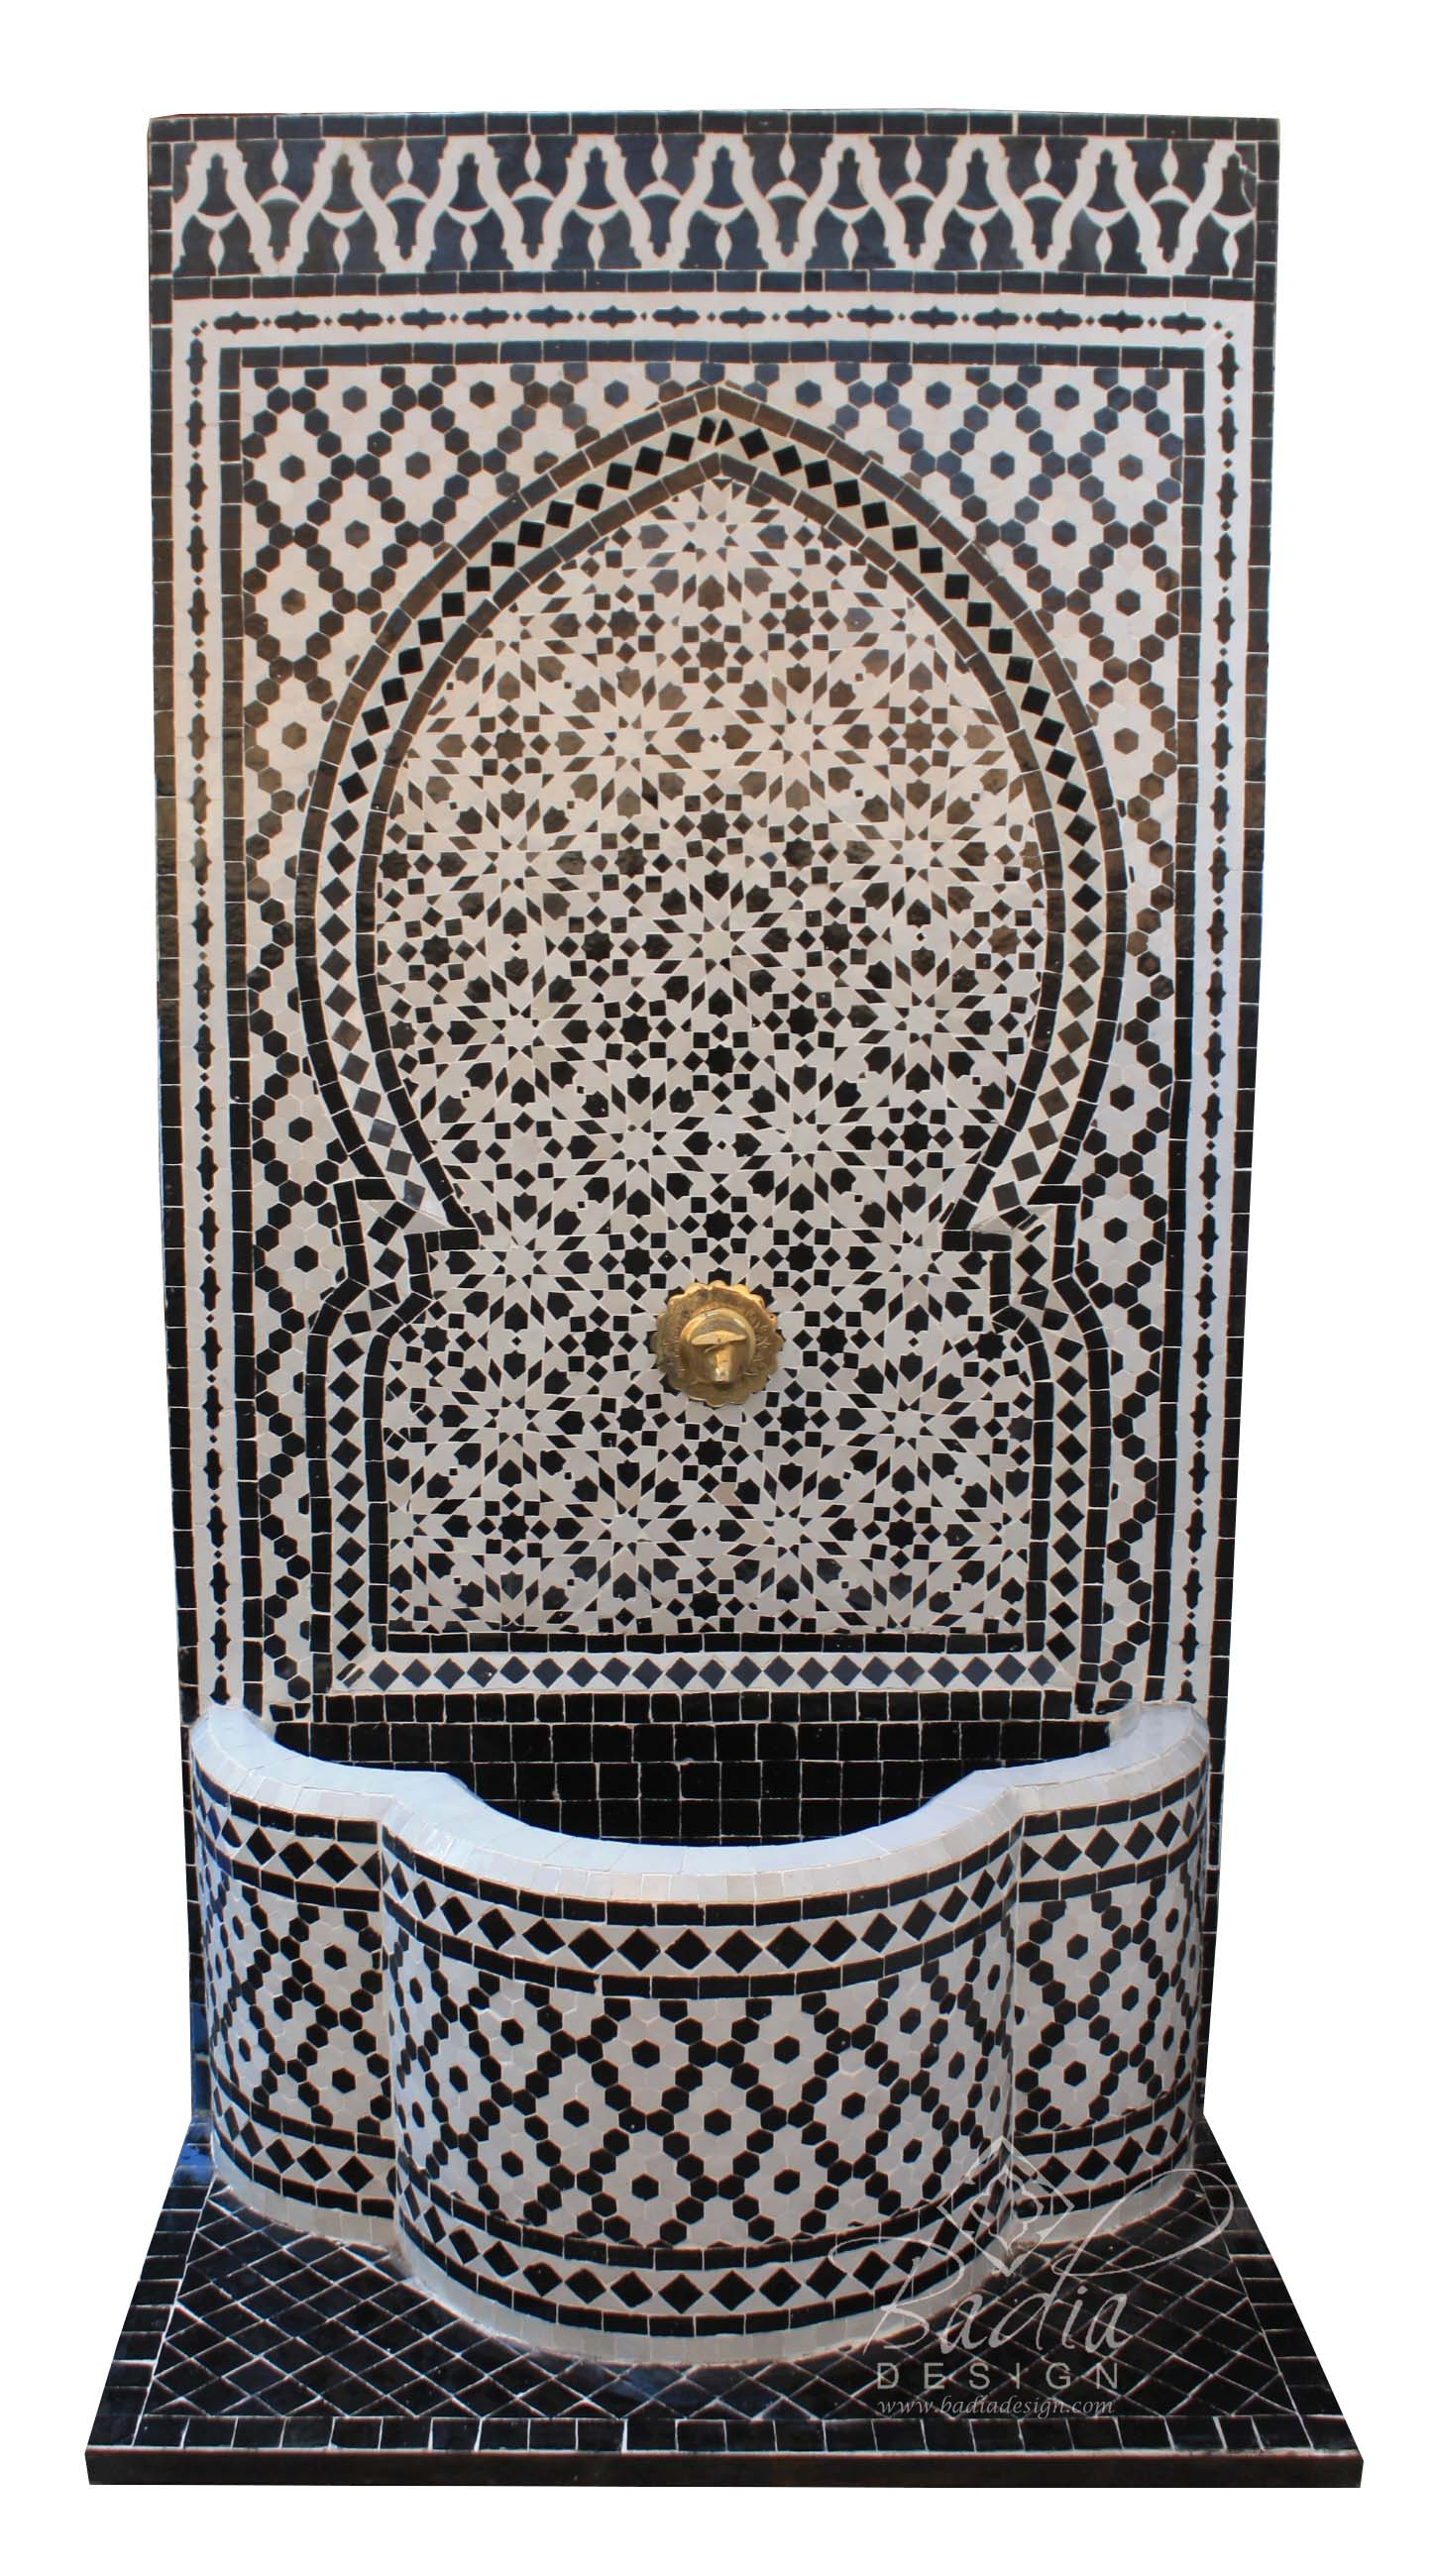 tall-moroccan-mosaic-tile-water-fountain-mf675.jpg